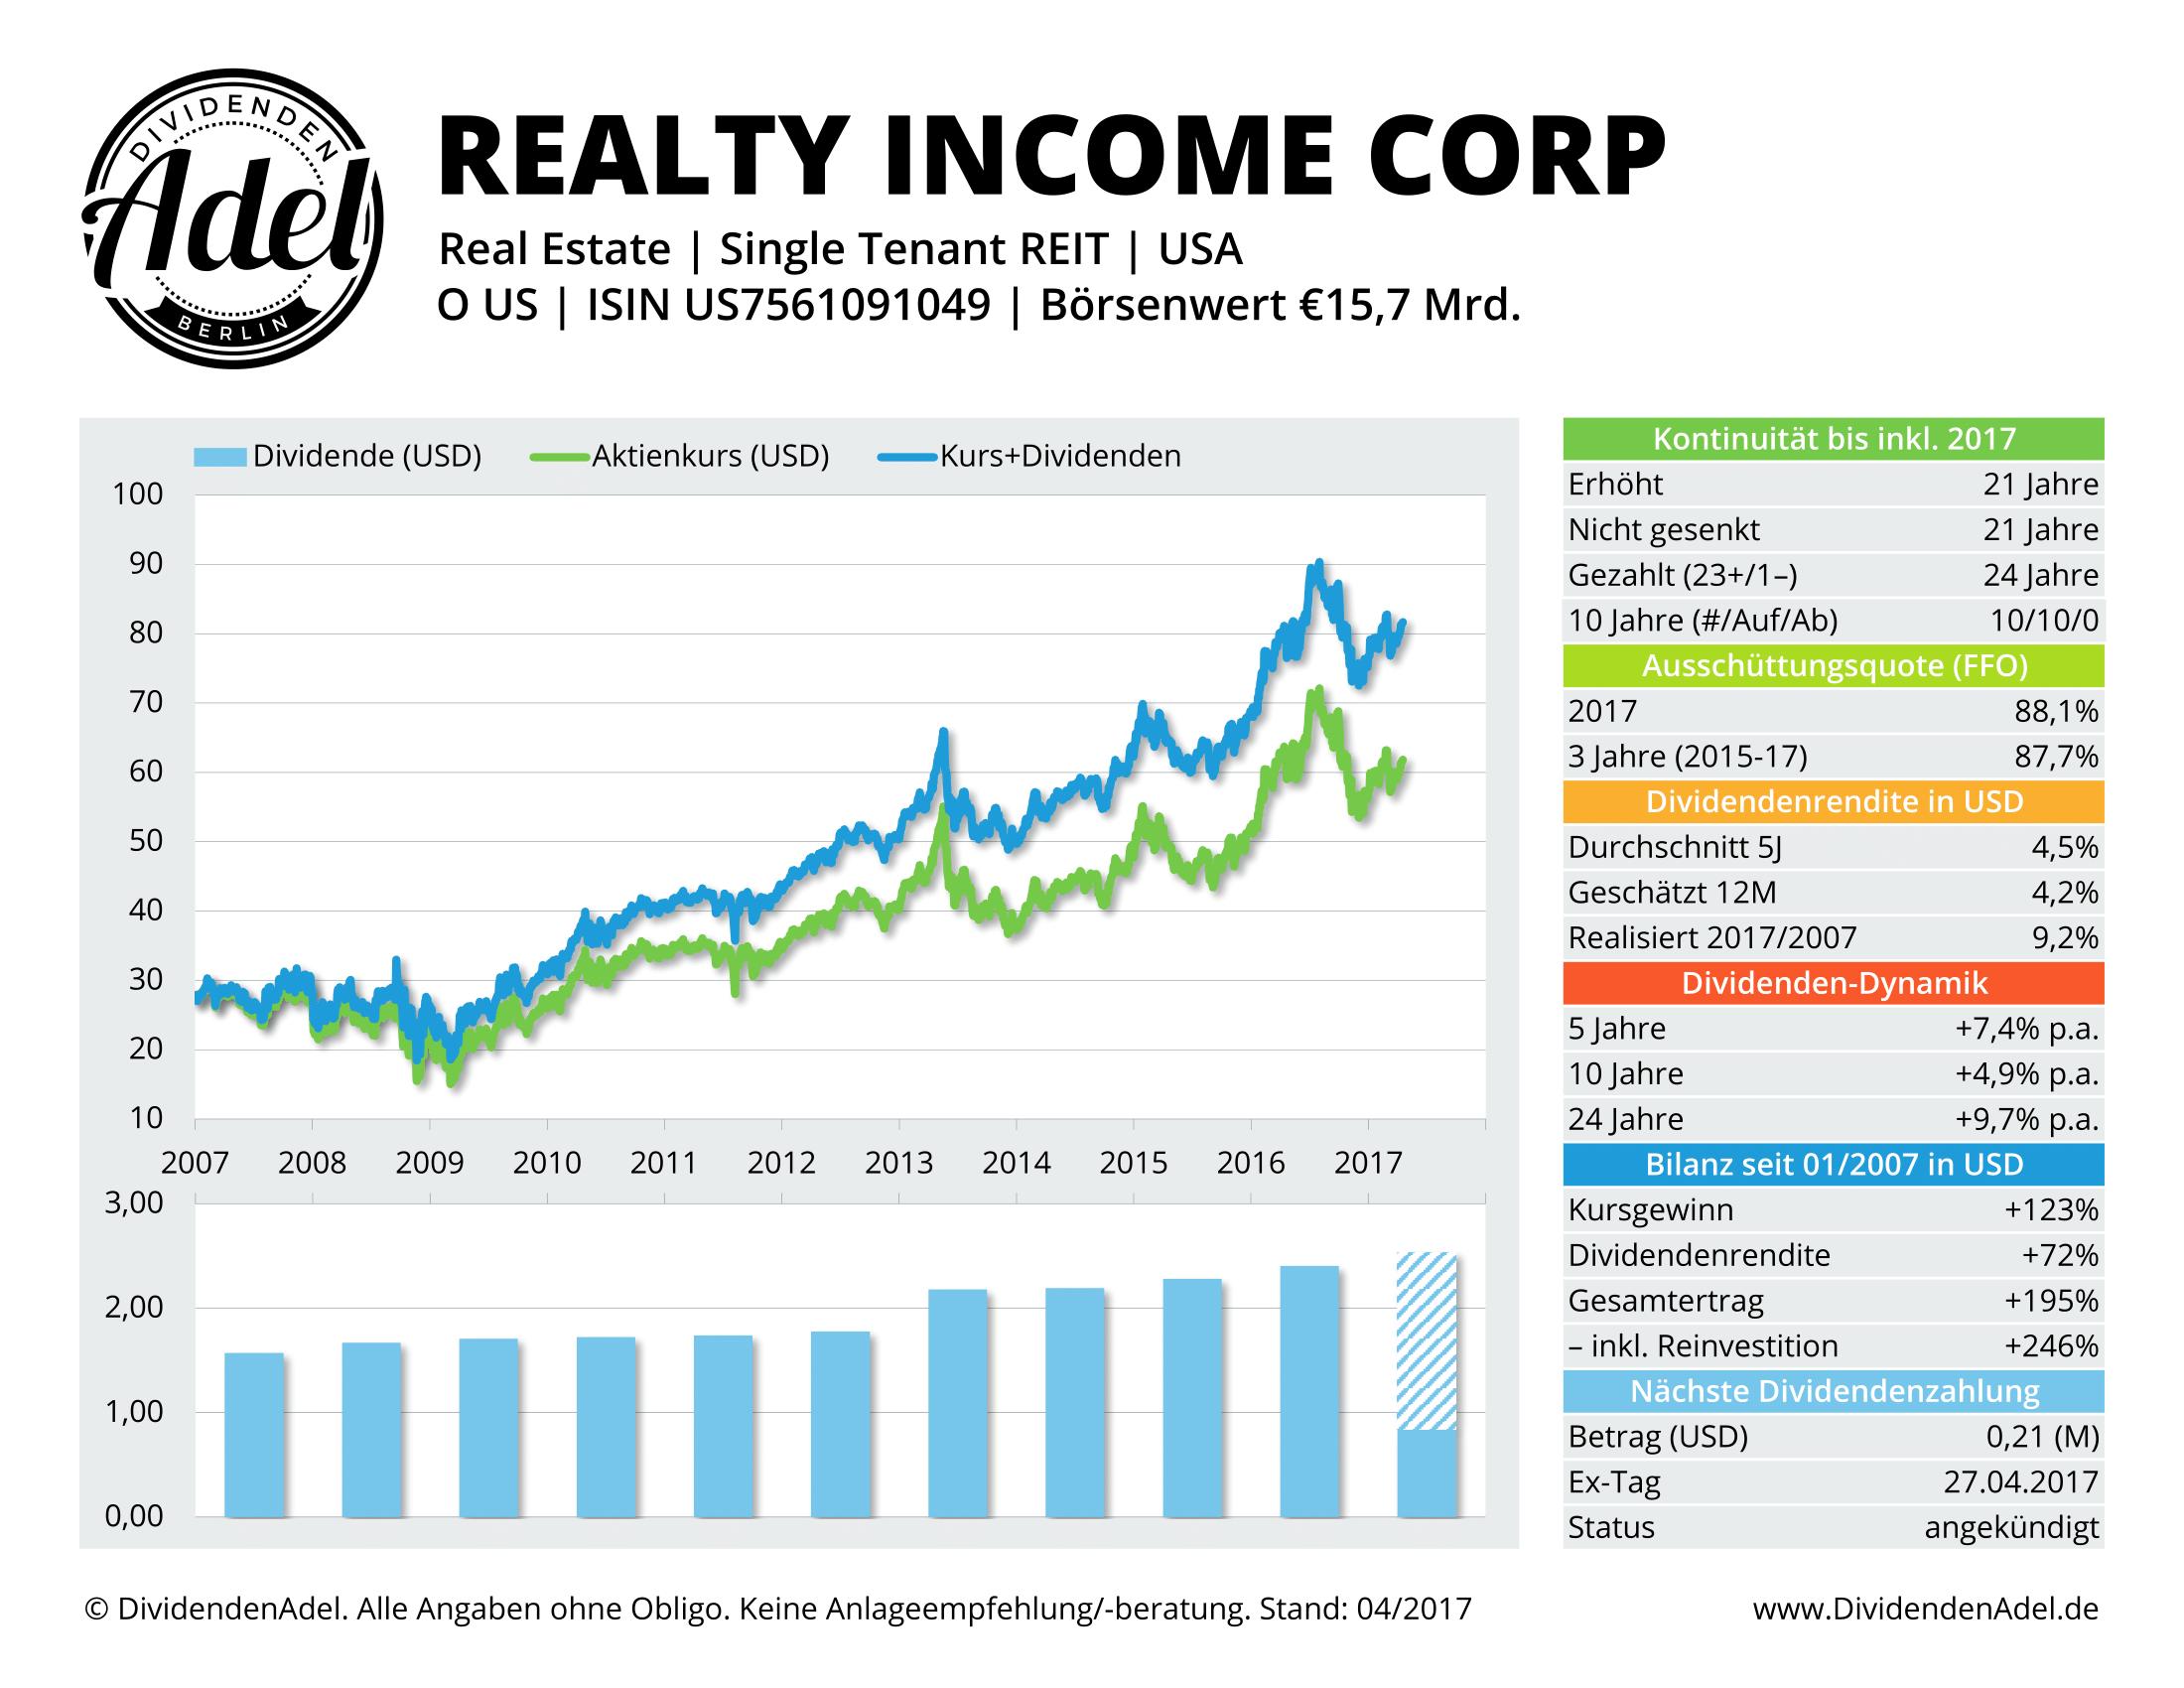 DividendenAdel Profil Realty Income Corp